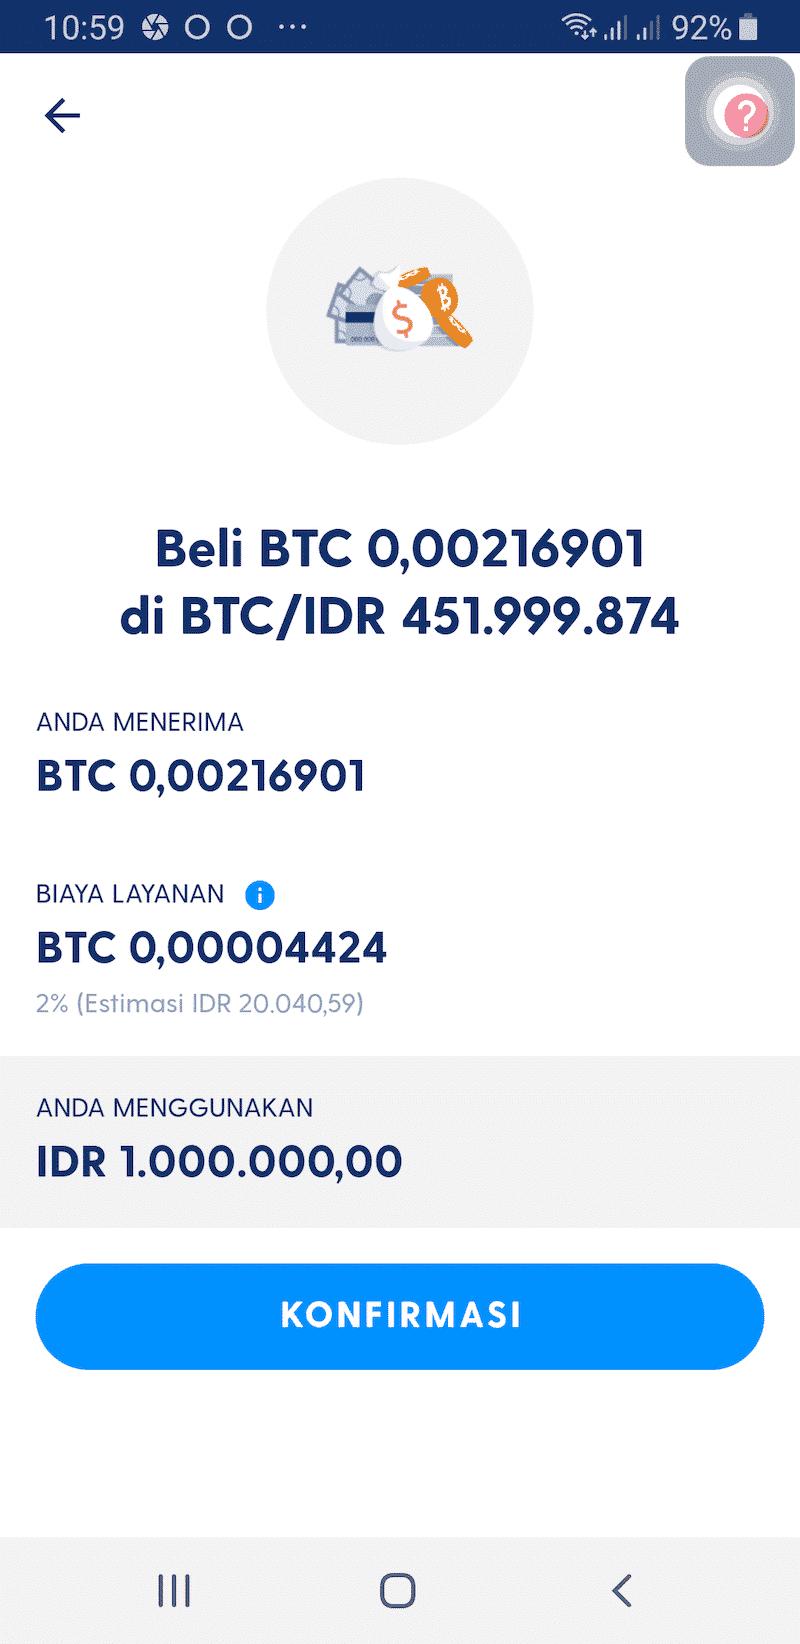 Beli Bitcoin Aplikasi Trading